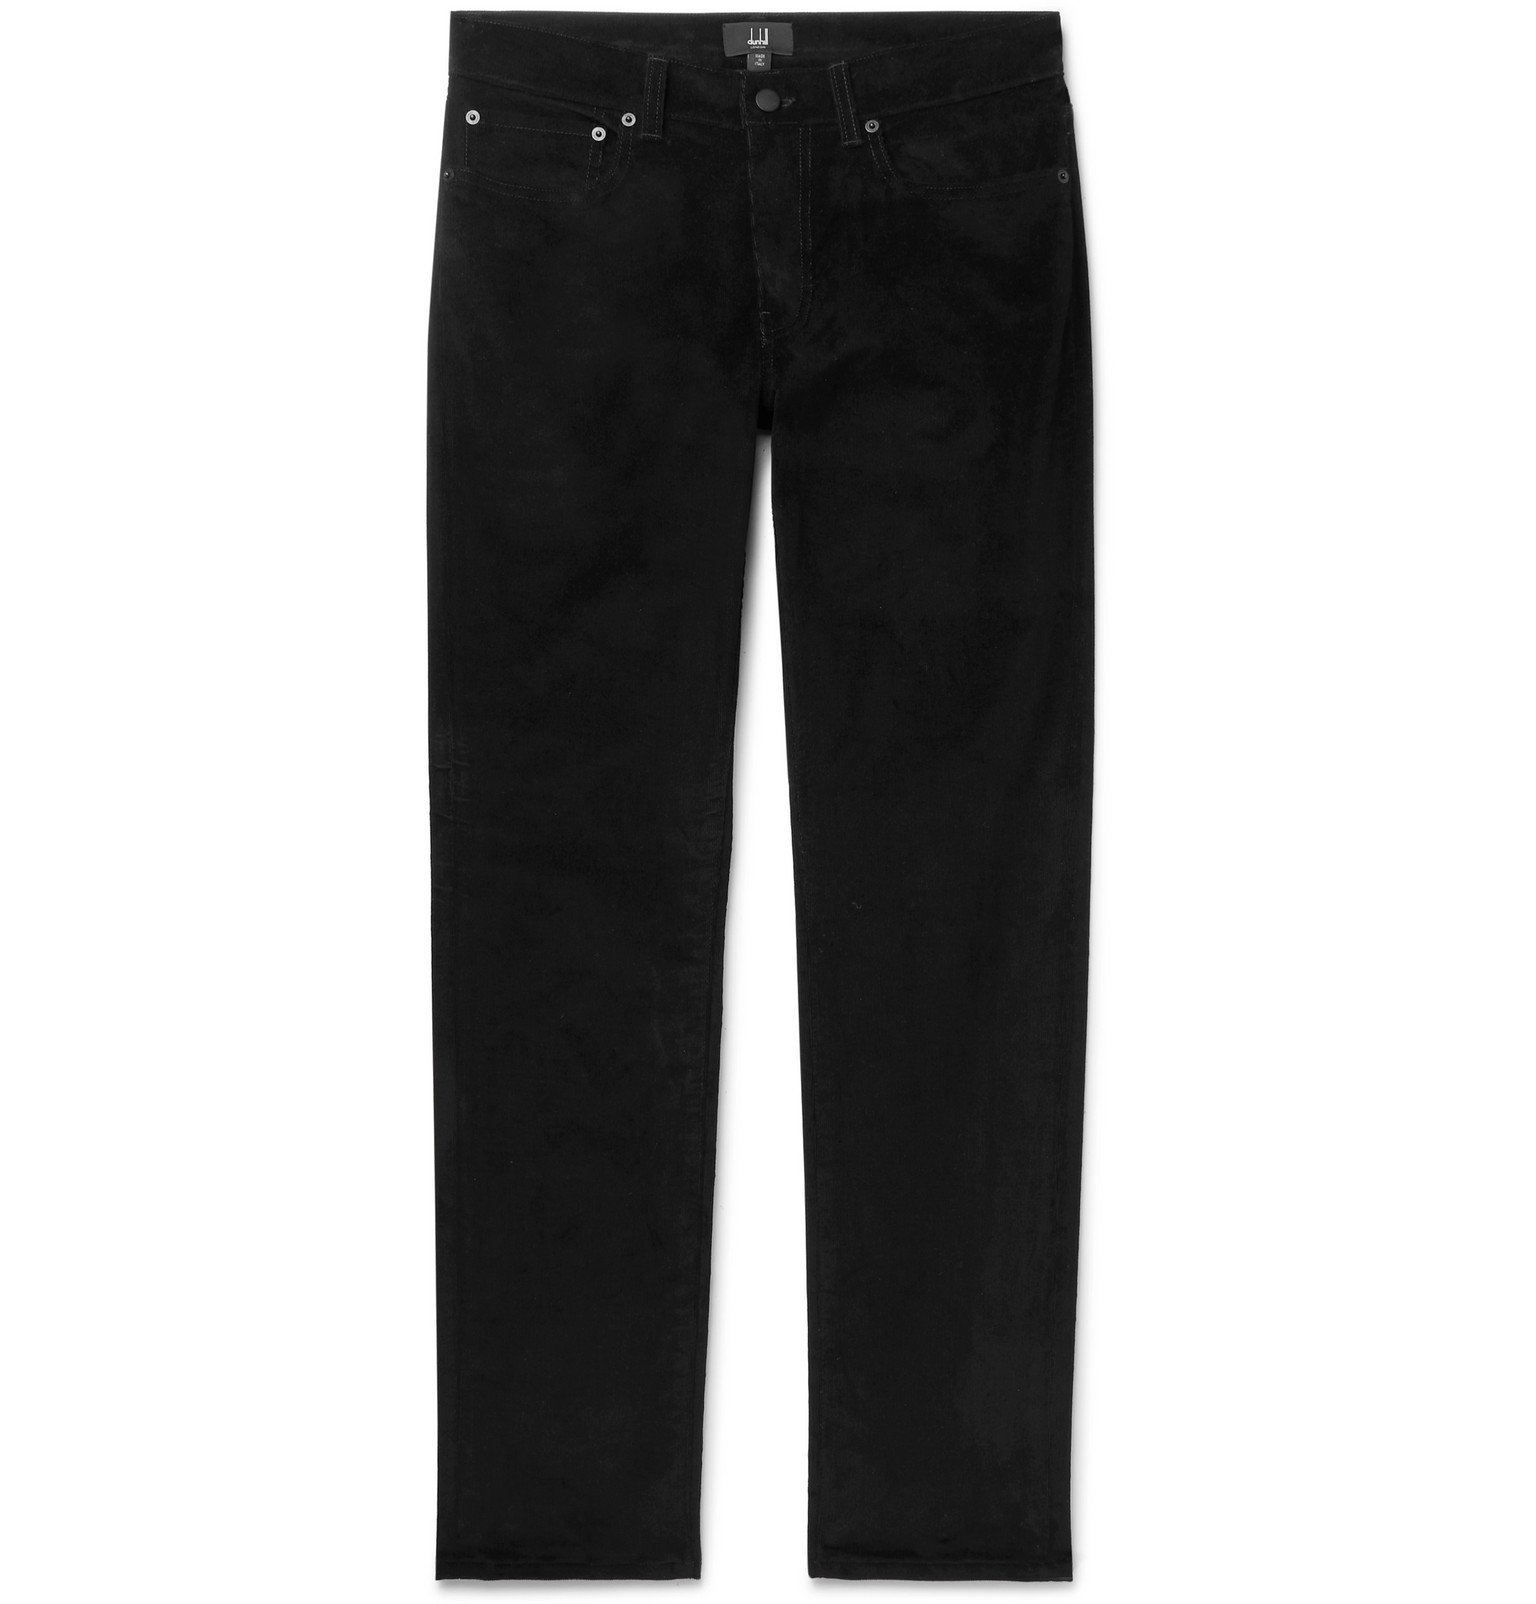 Dunhill - Black Slim-Fit Stretch-Cotton Corduroy Trousers - Black